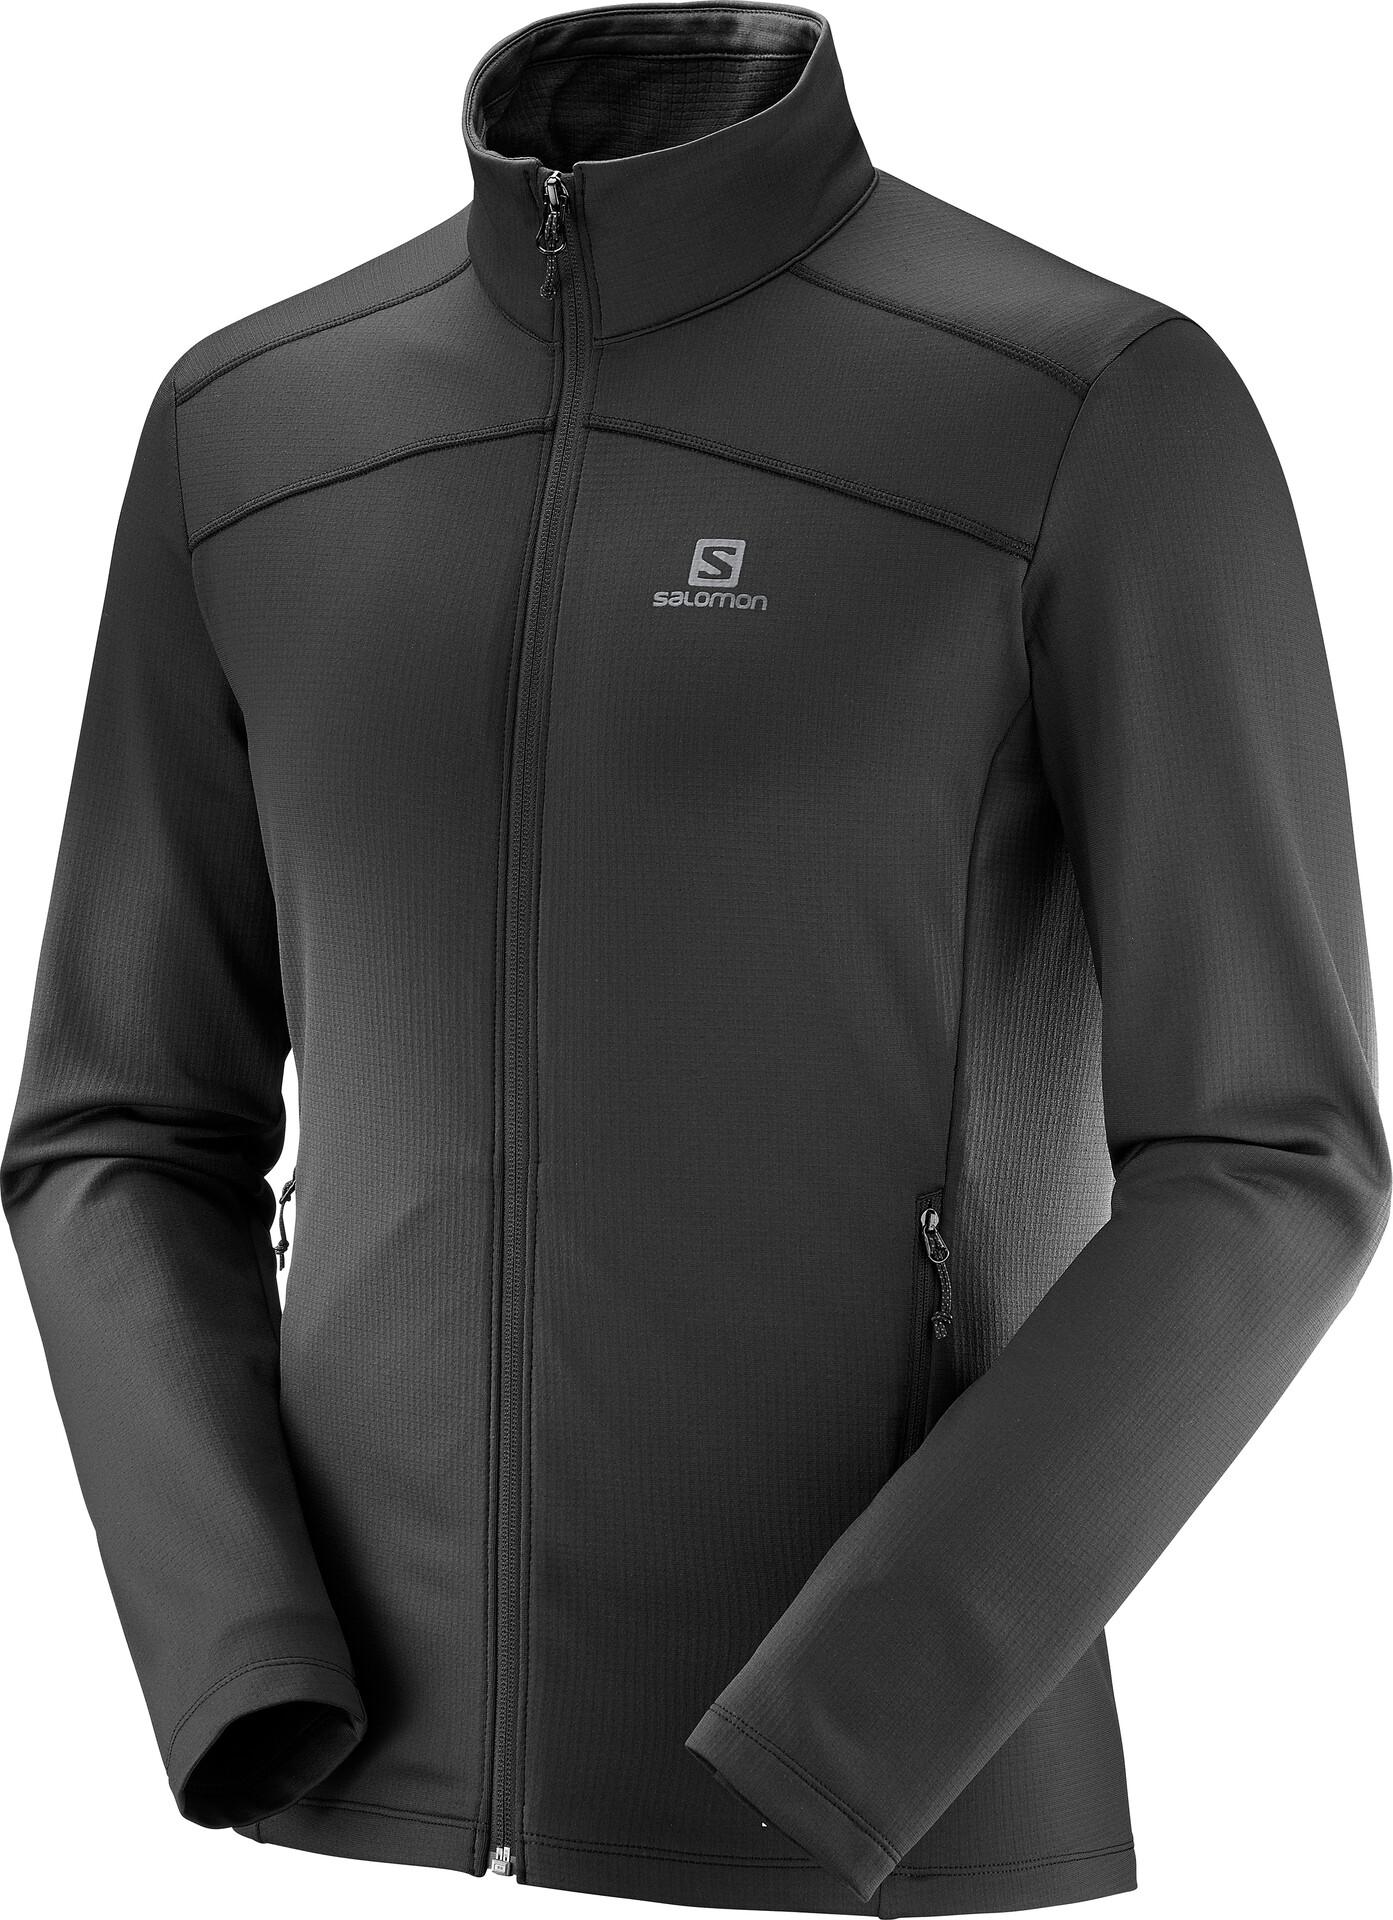 Salomon Discovery LT FZ Jacket Herren black